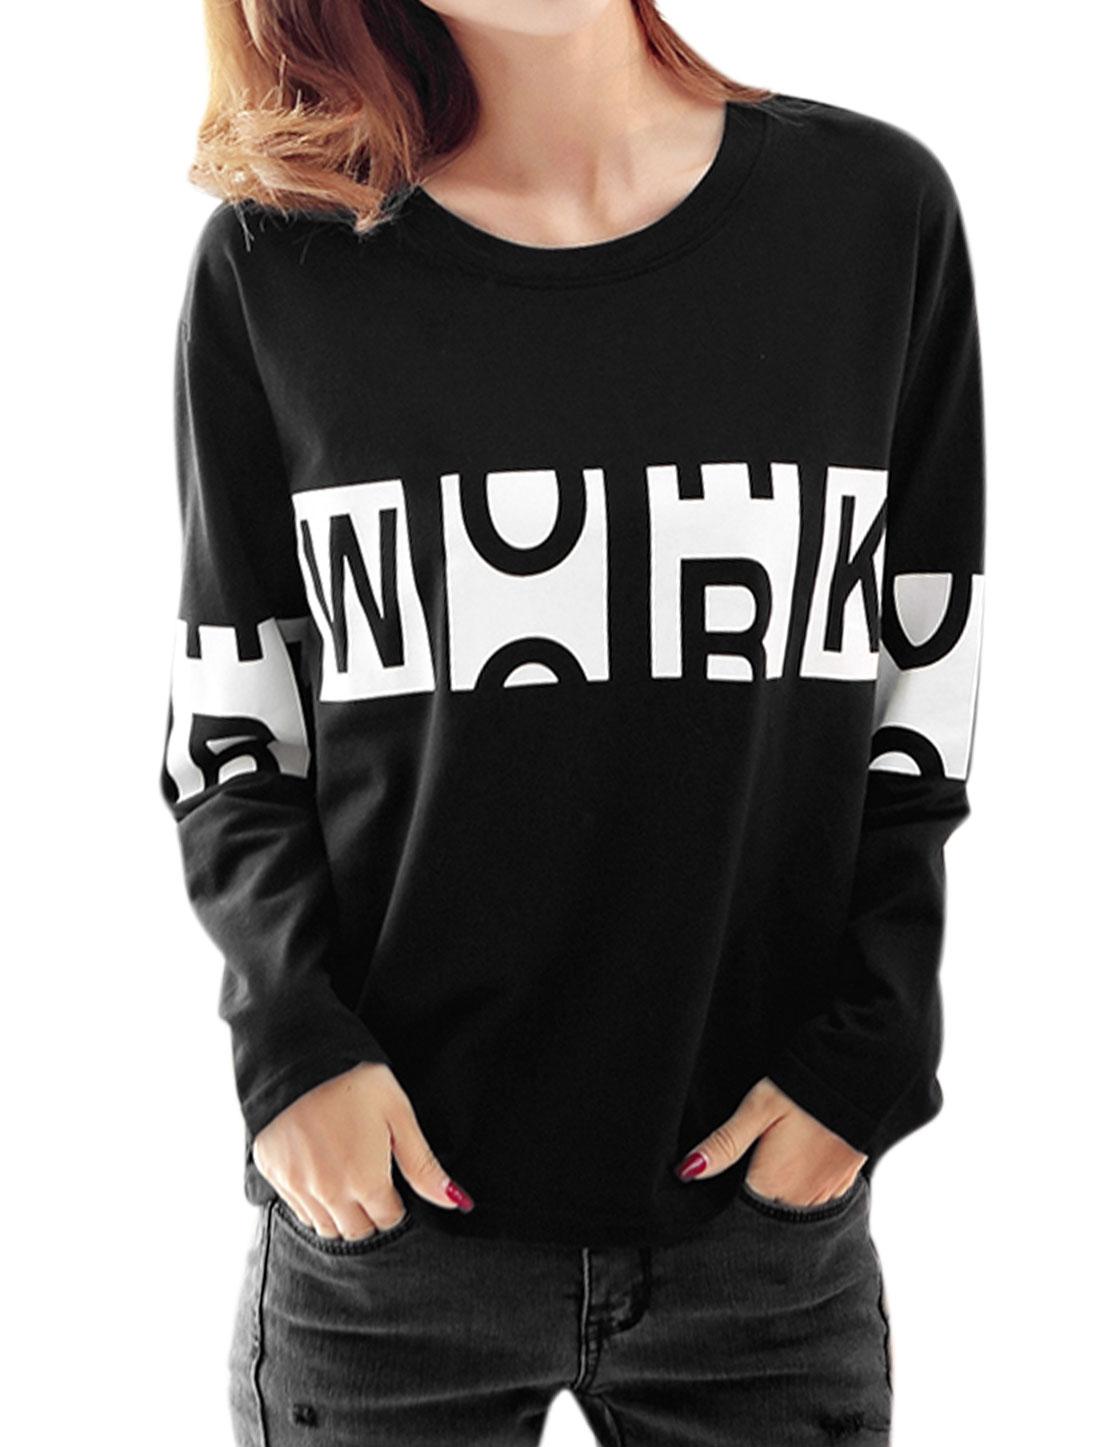 Women Round Neck Long Sleeves Letter Prints Loose Sweatshirt Black S